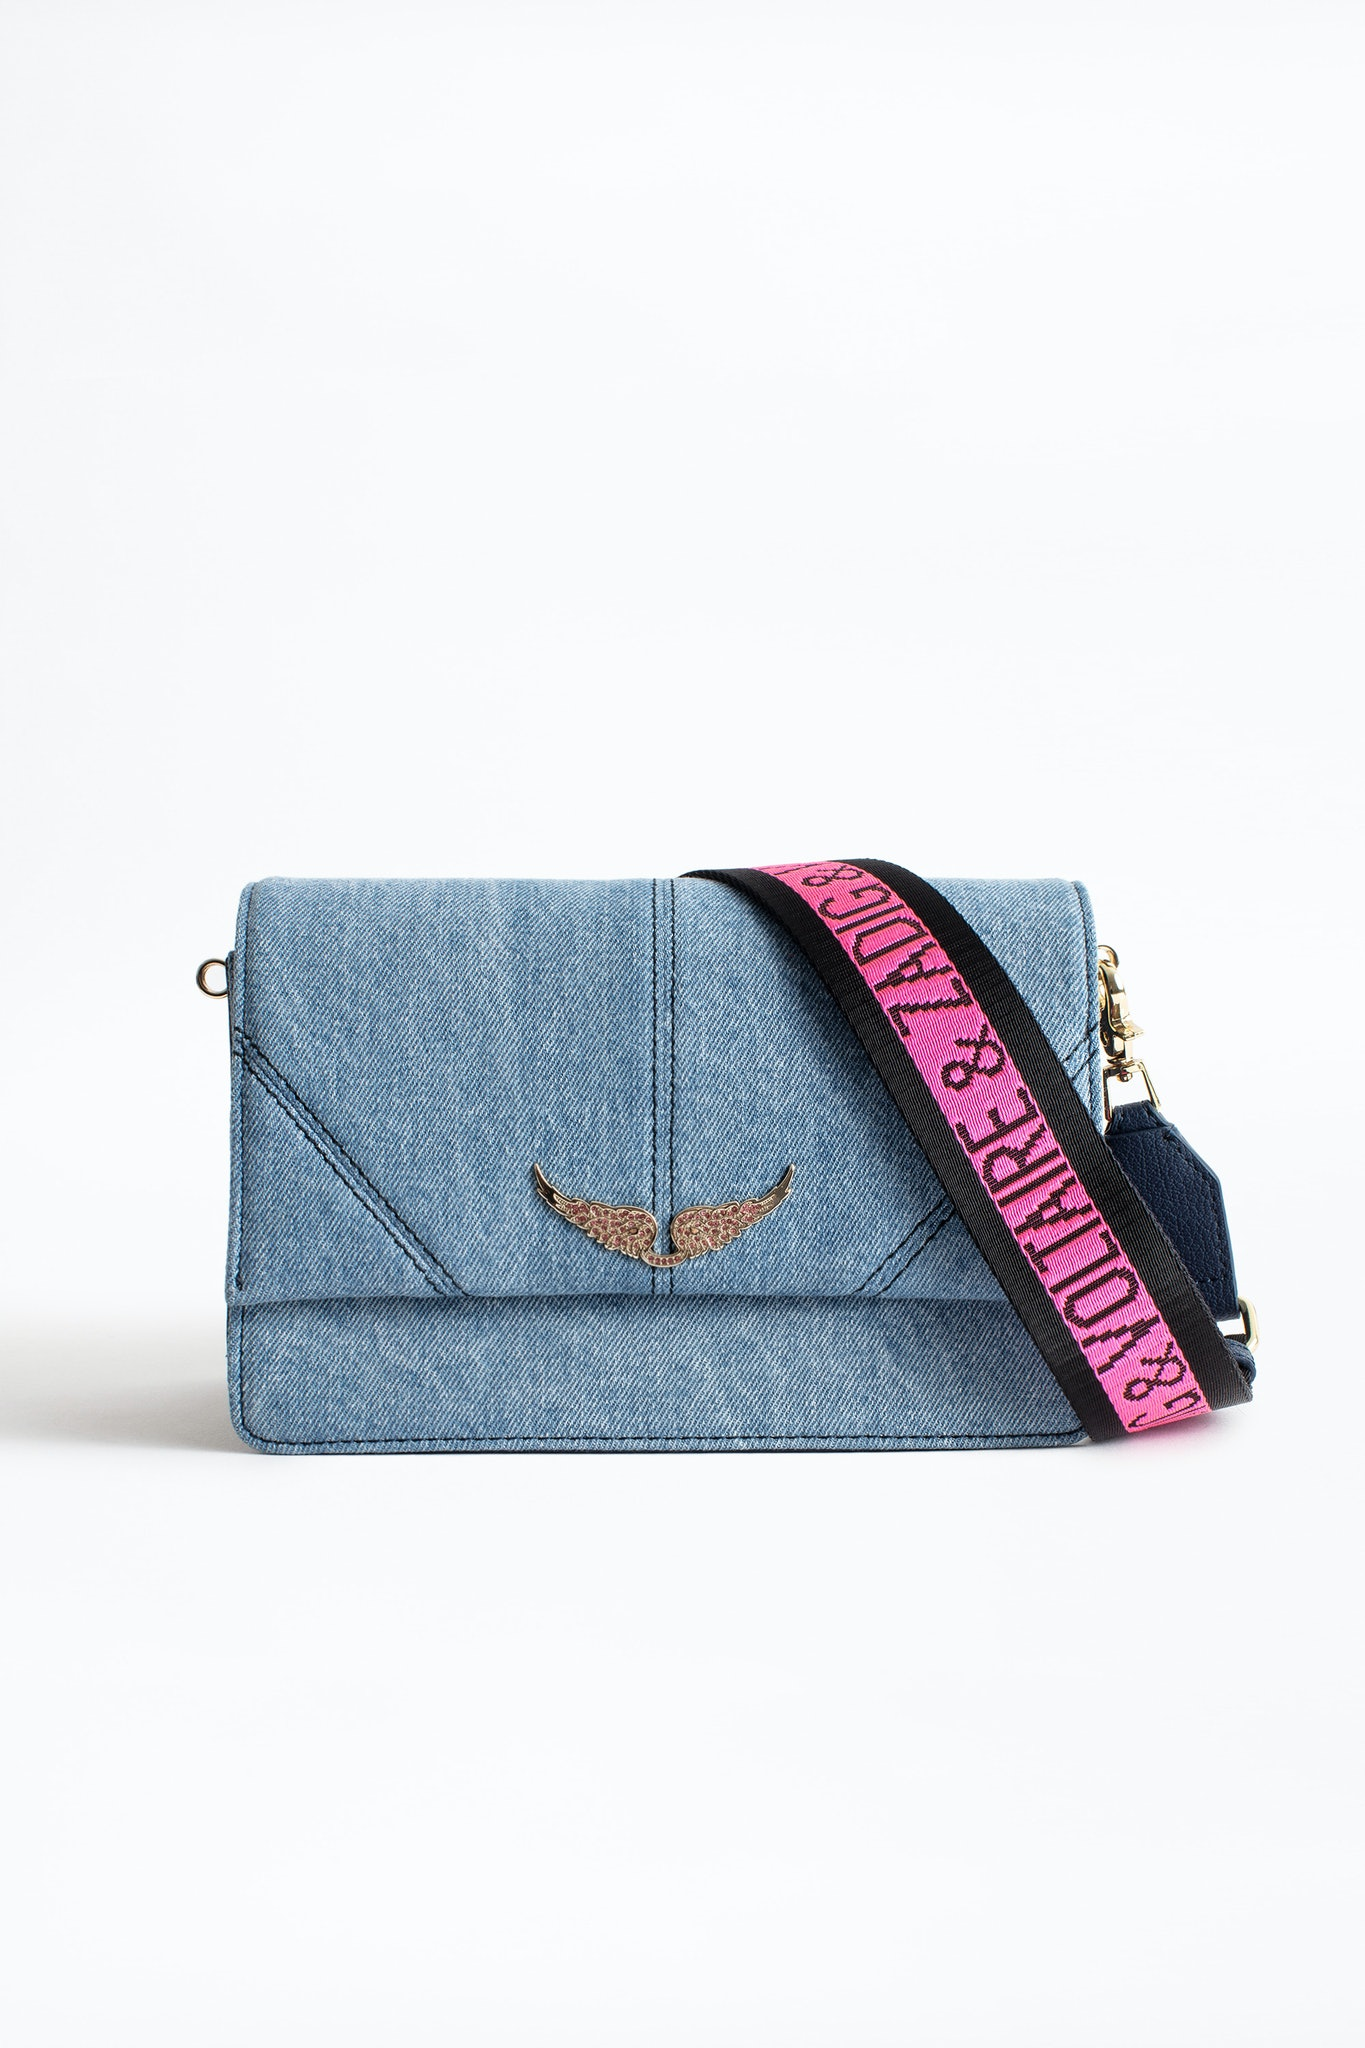 Sac Lolita Jeans